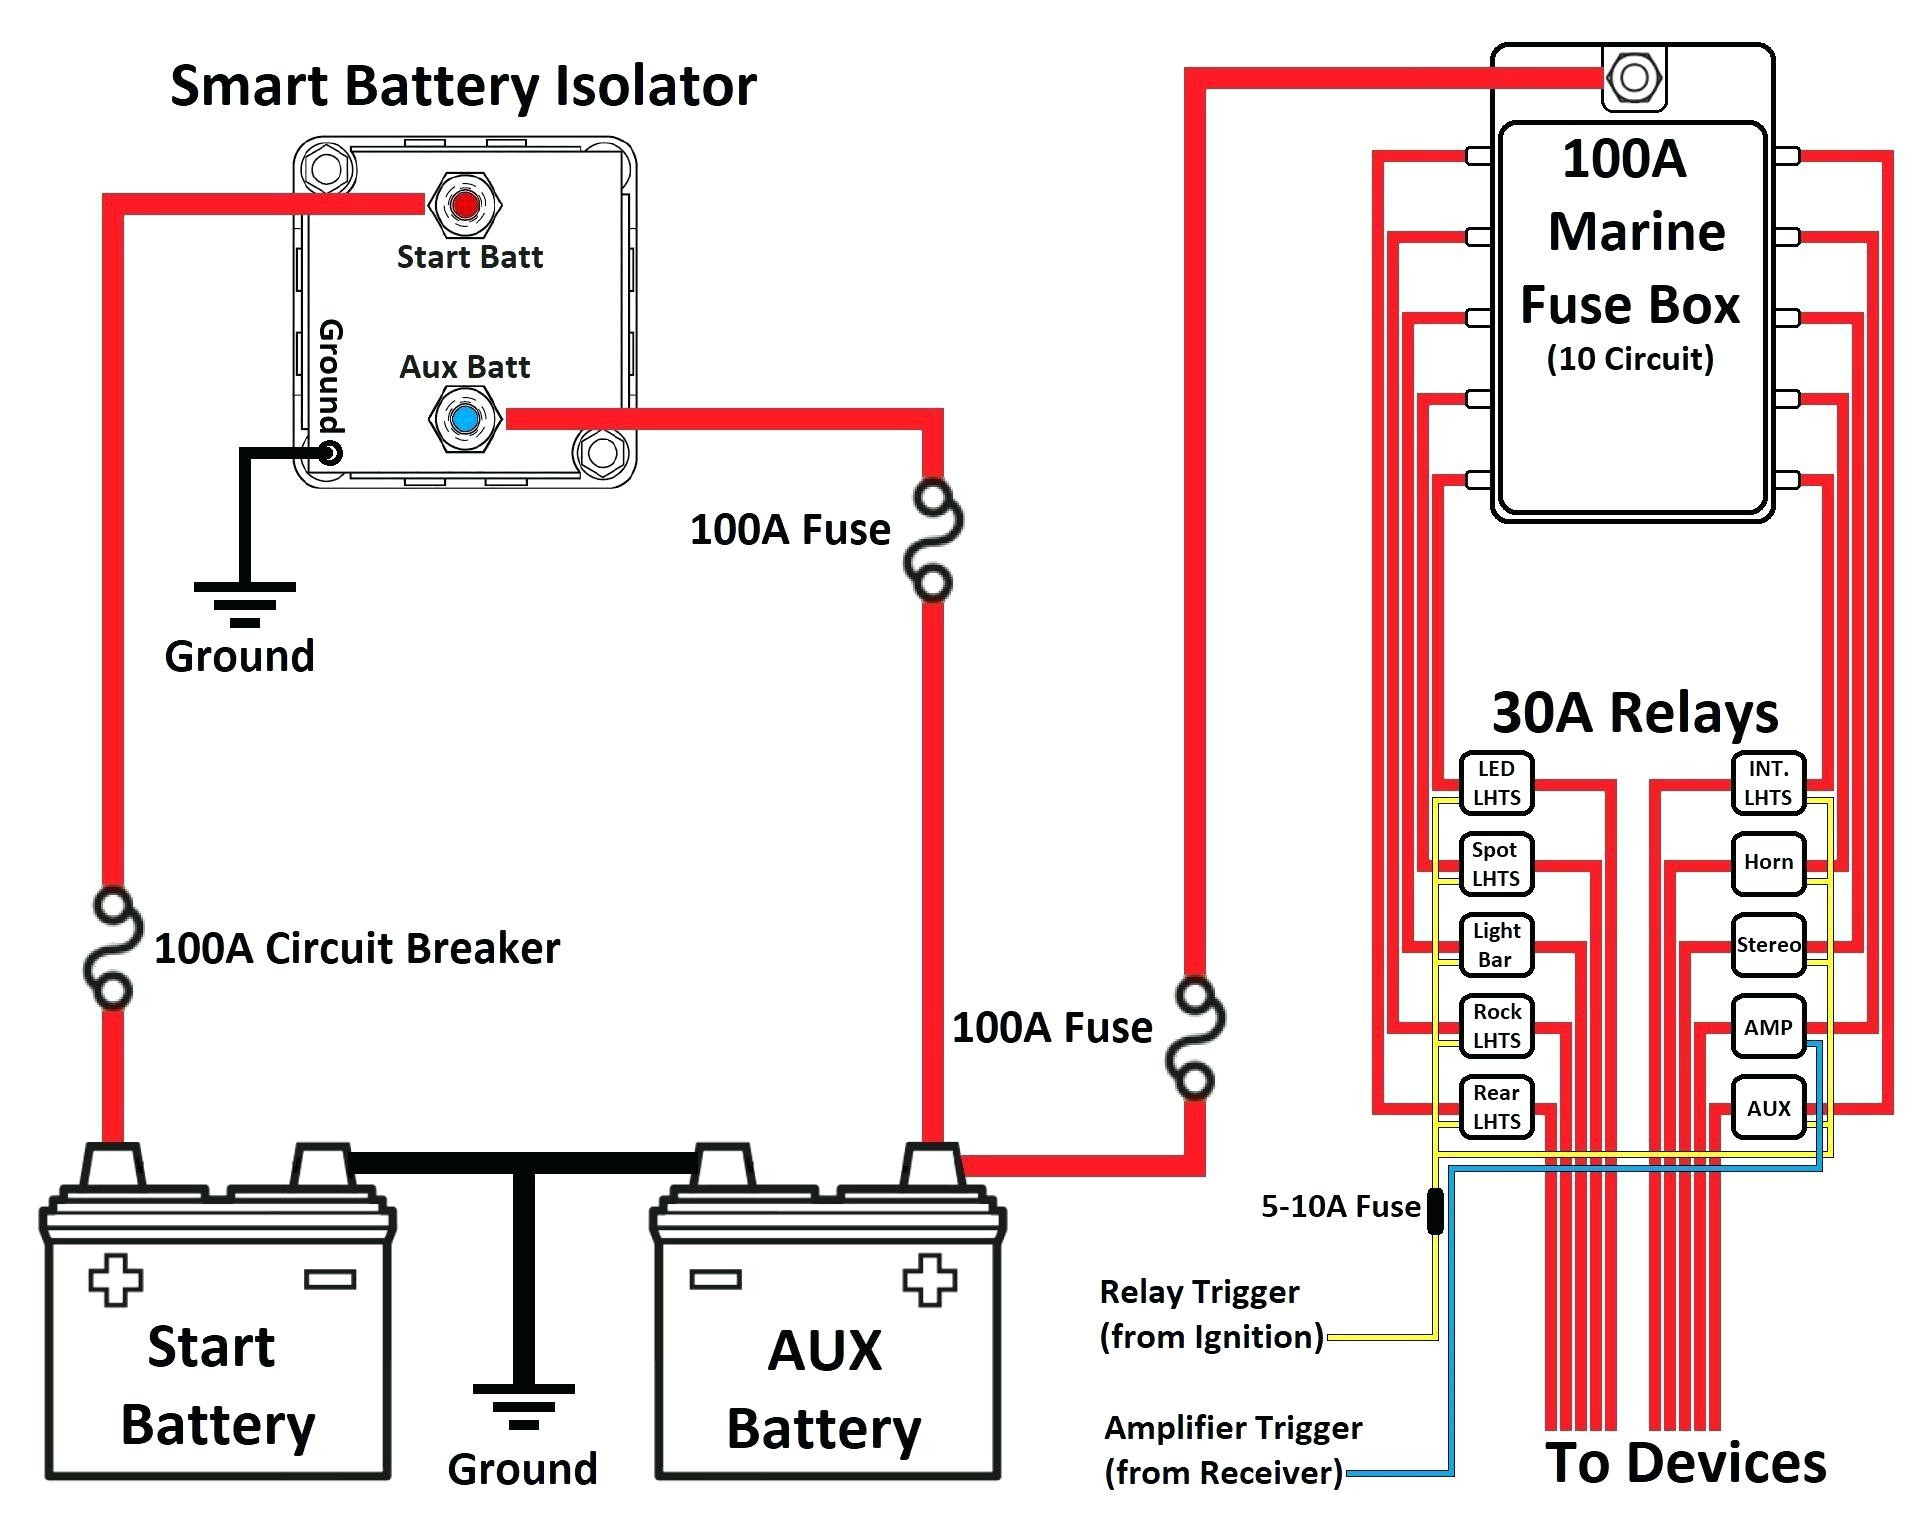 True Battery isolator Wiring Diagram | Free Wiring Diagram on switch relay wiring, fuel pump relay wiring, electrical relay wiring, blower motor relay wiring, light bar relay wiring, led relay wiring, thermostat relay wiring, opto-isolator relay wiring, flasher relay wiring, starter relay wiring,